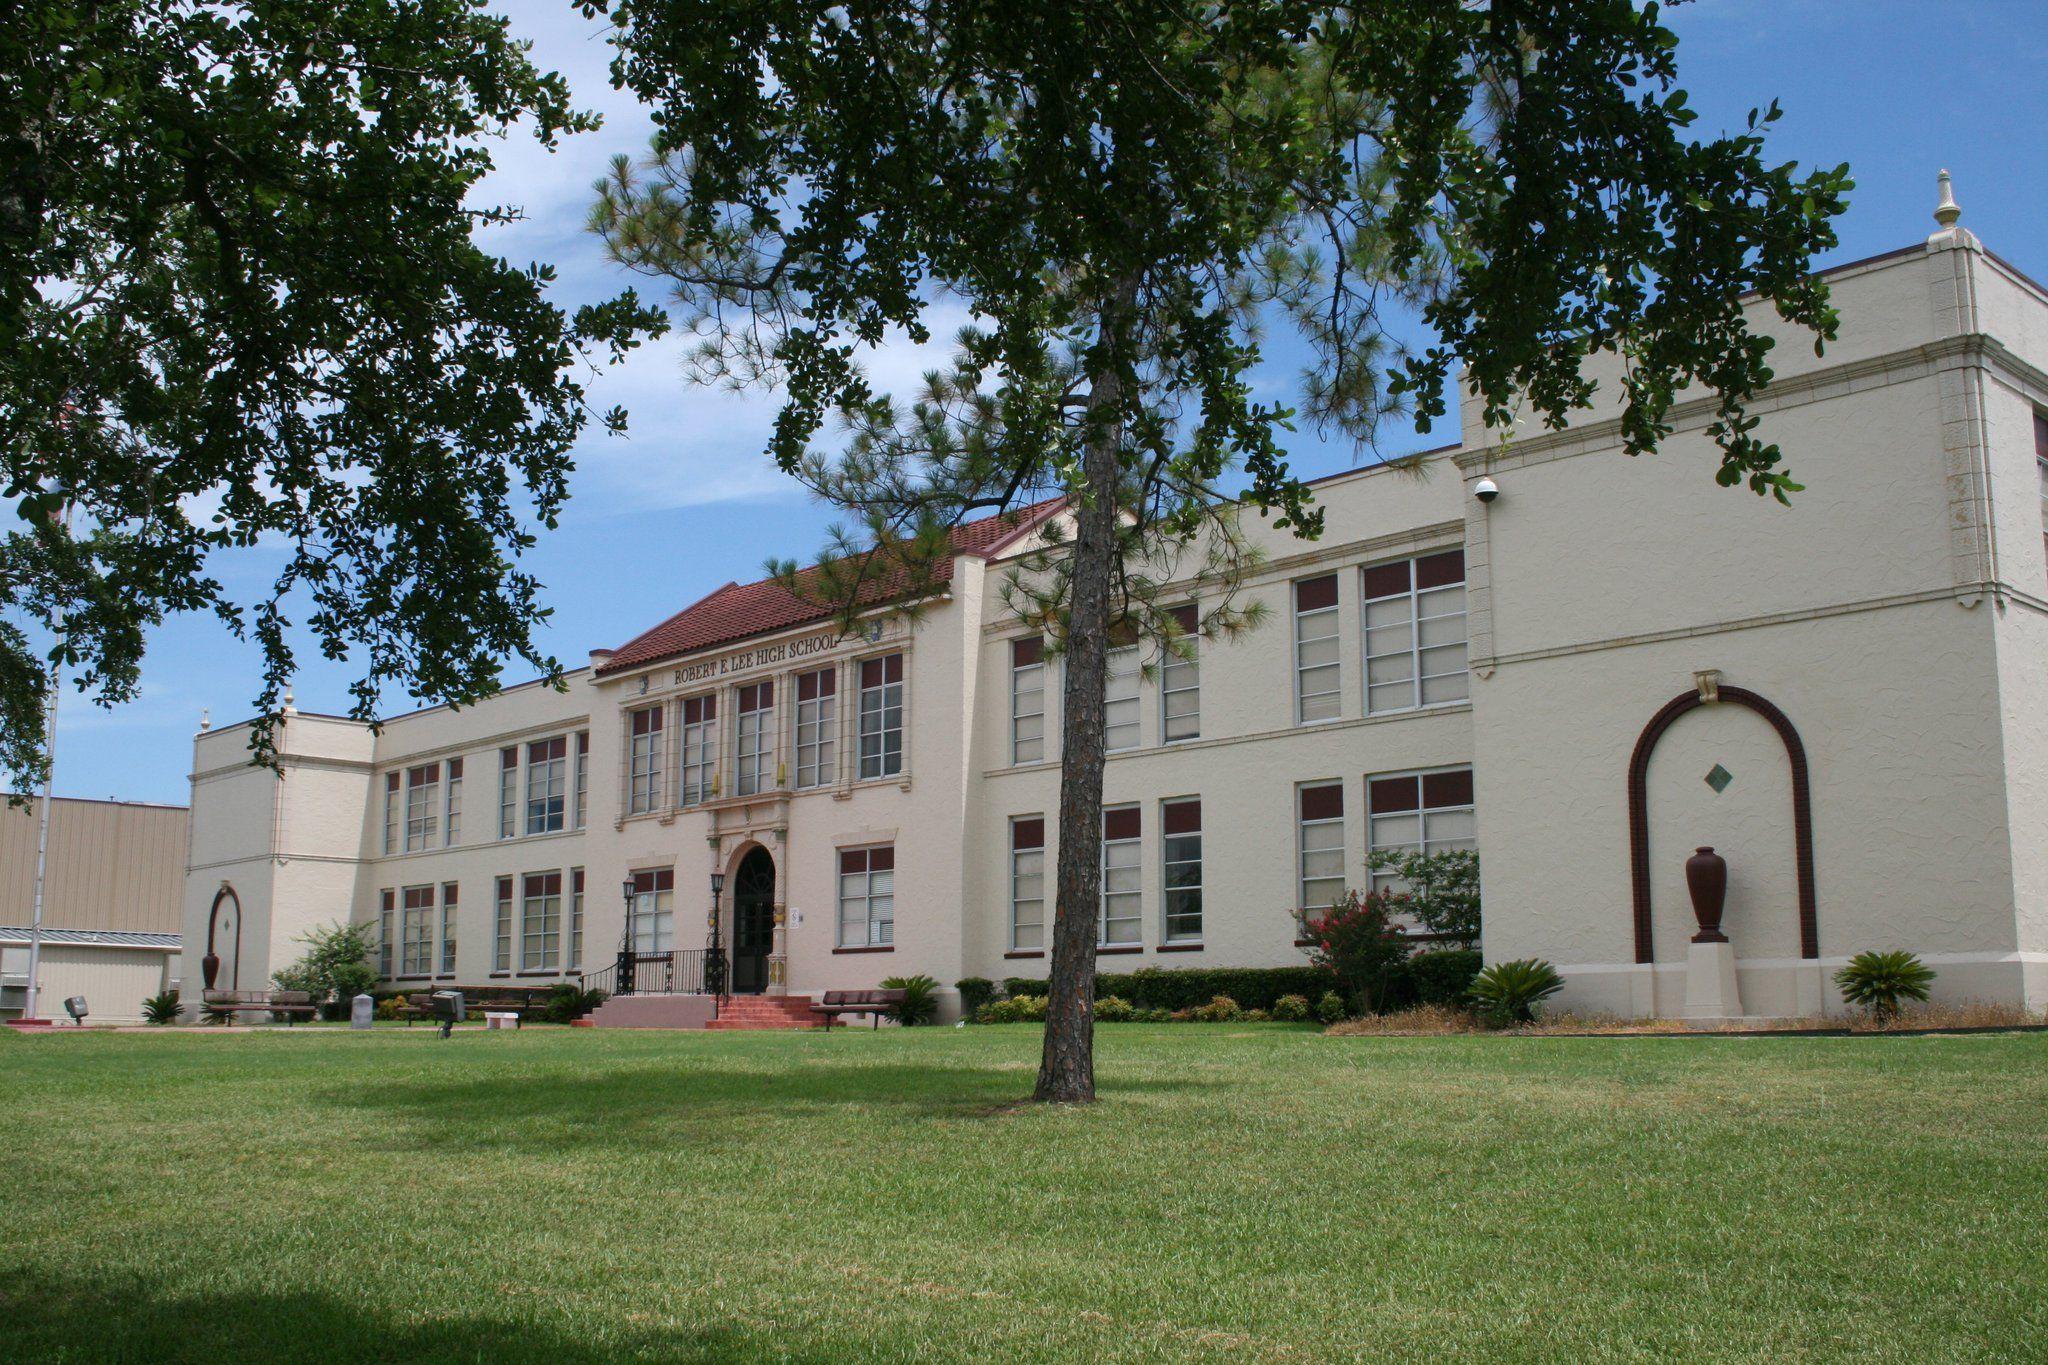 Robert E Lee Senior High School Market Street Baytown Texas